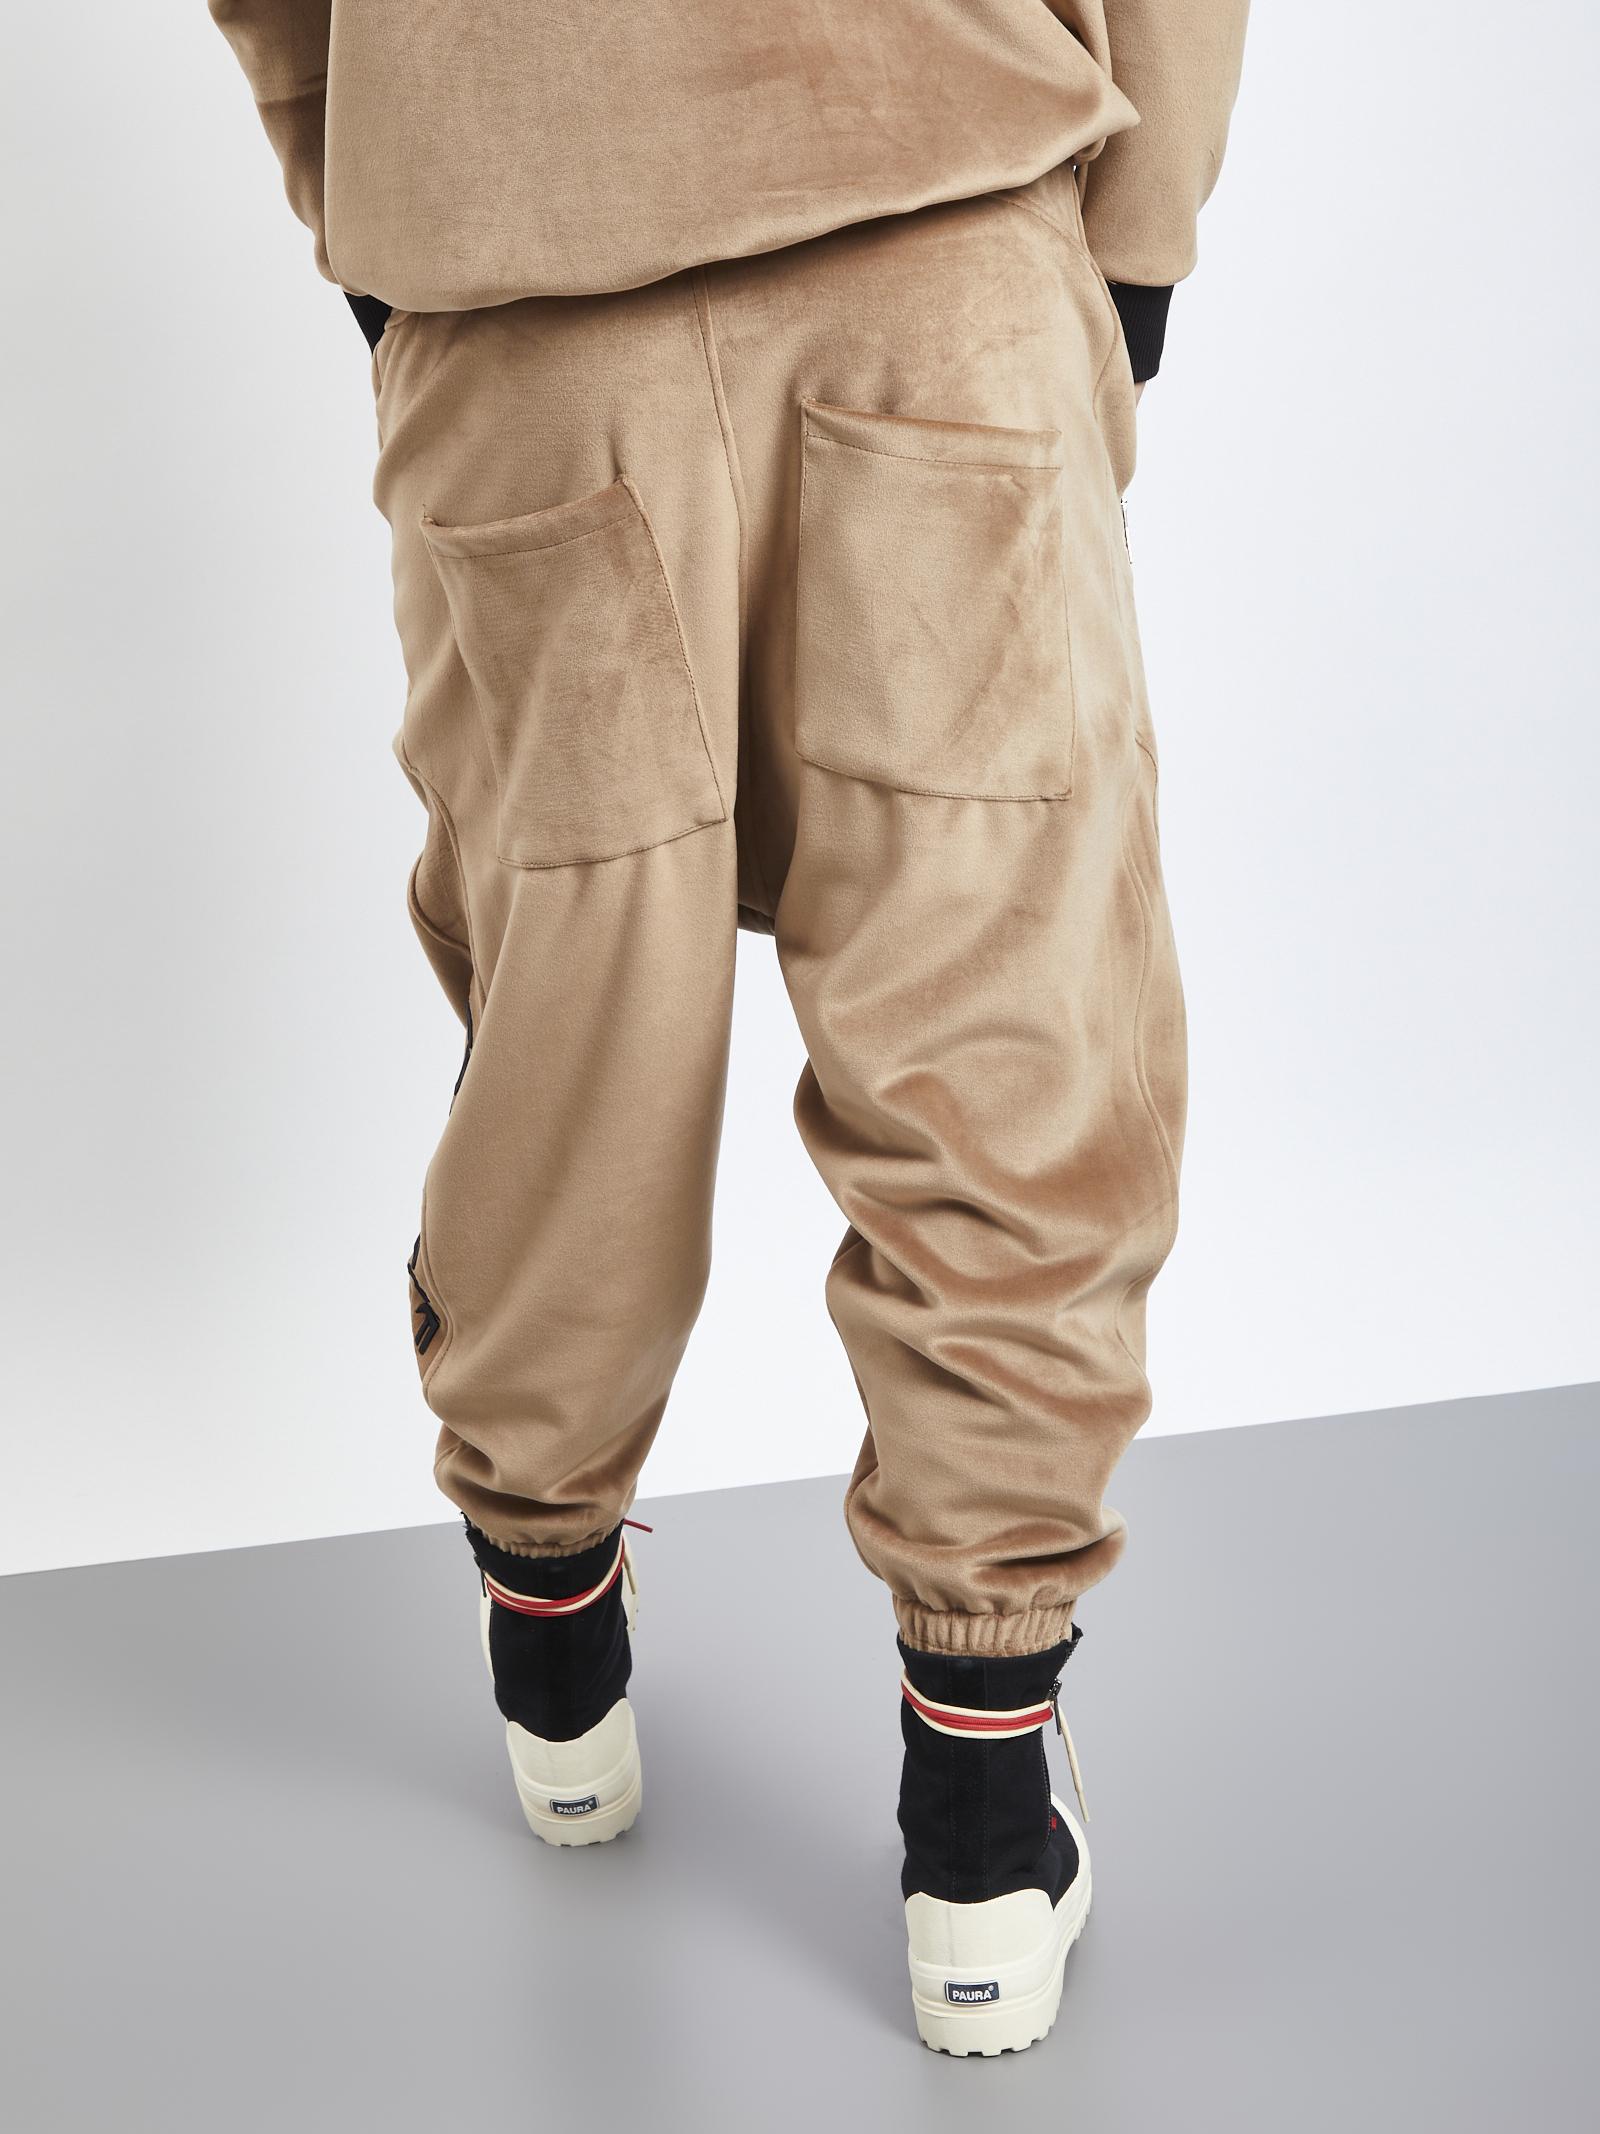 GAVENSEMBLE | Trousers | PANT-333CUOIO